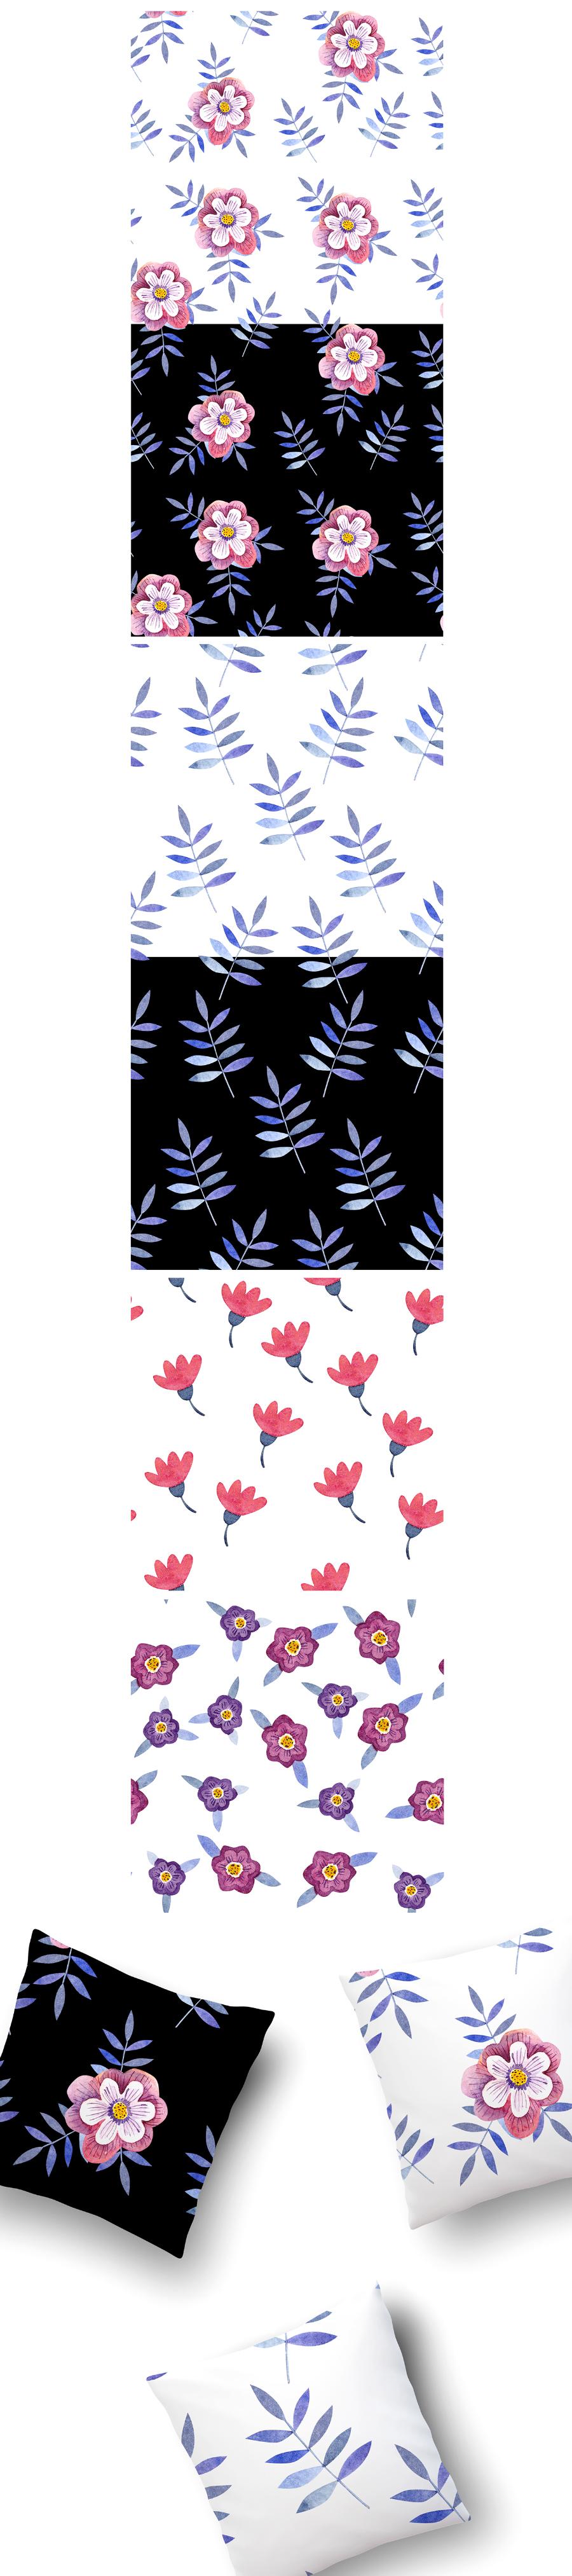 4 Free Hand-drawn Patterns